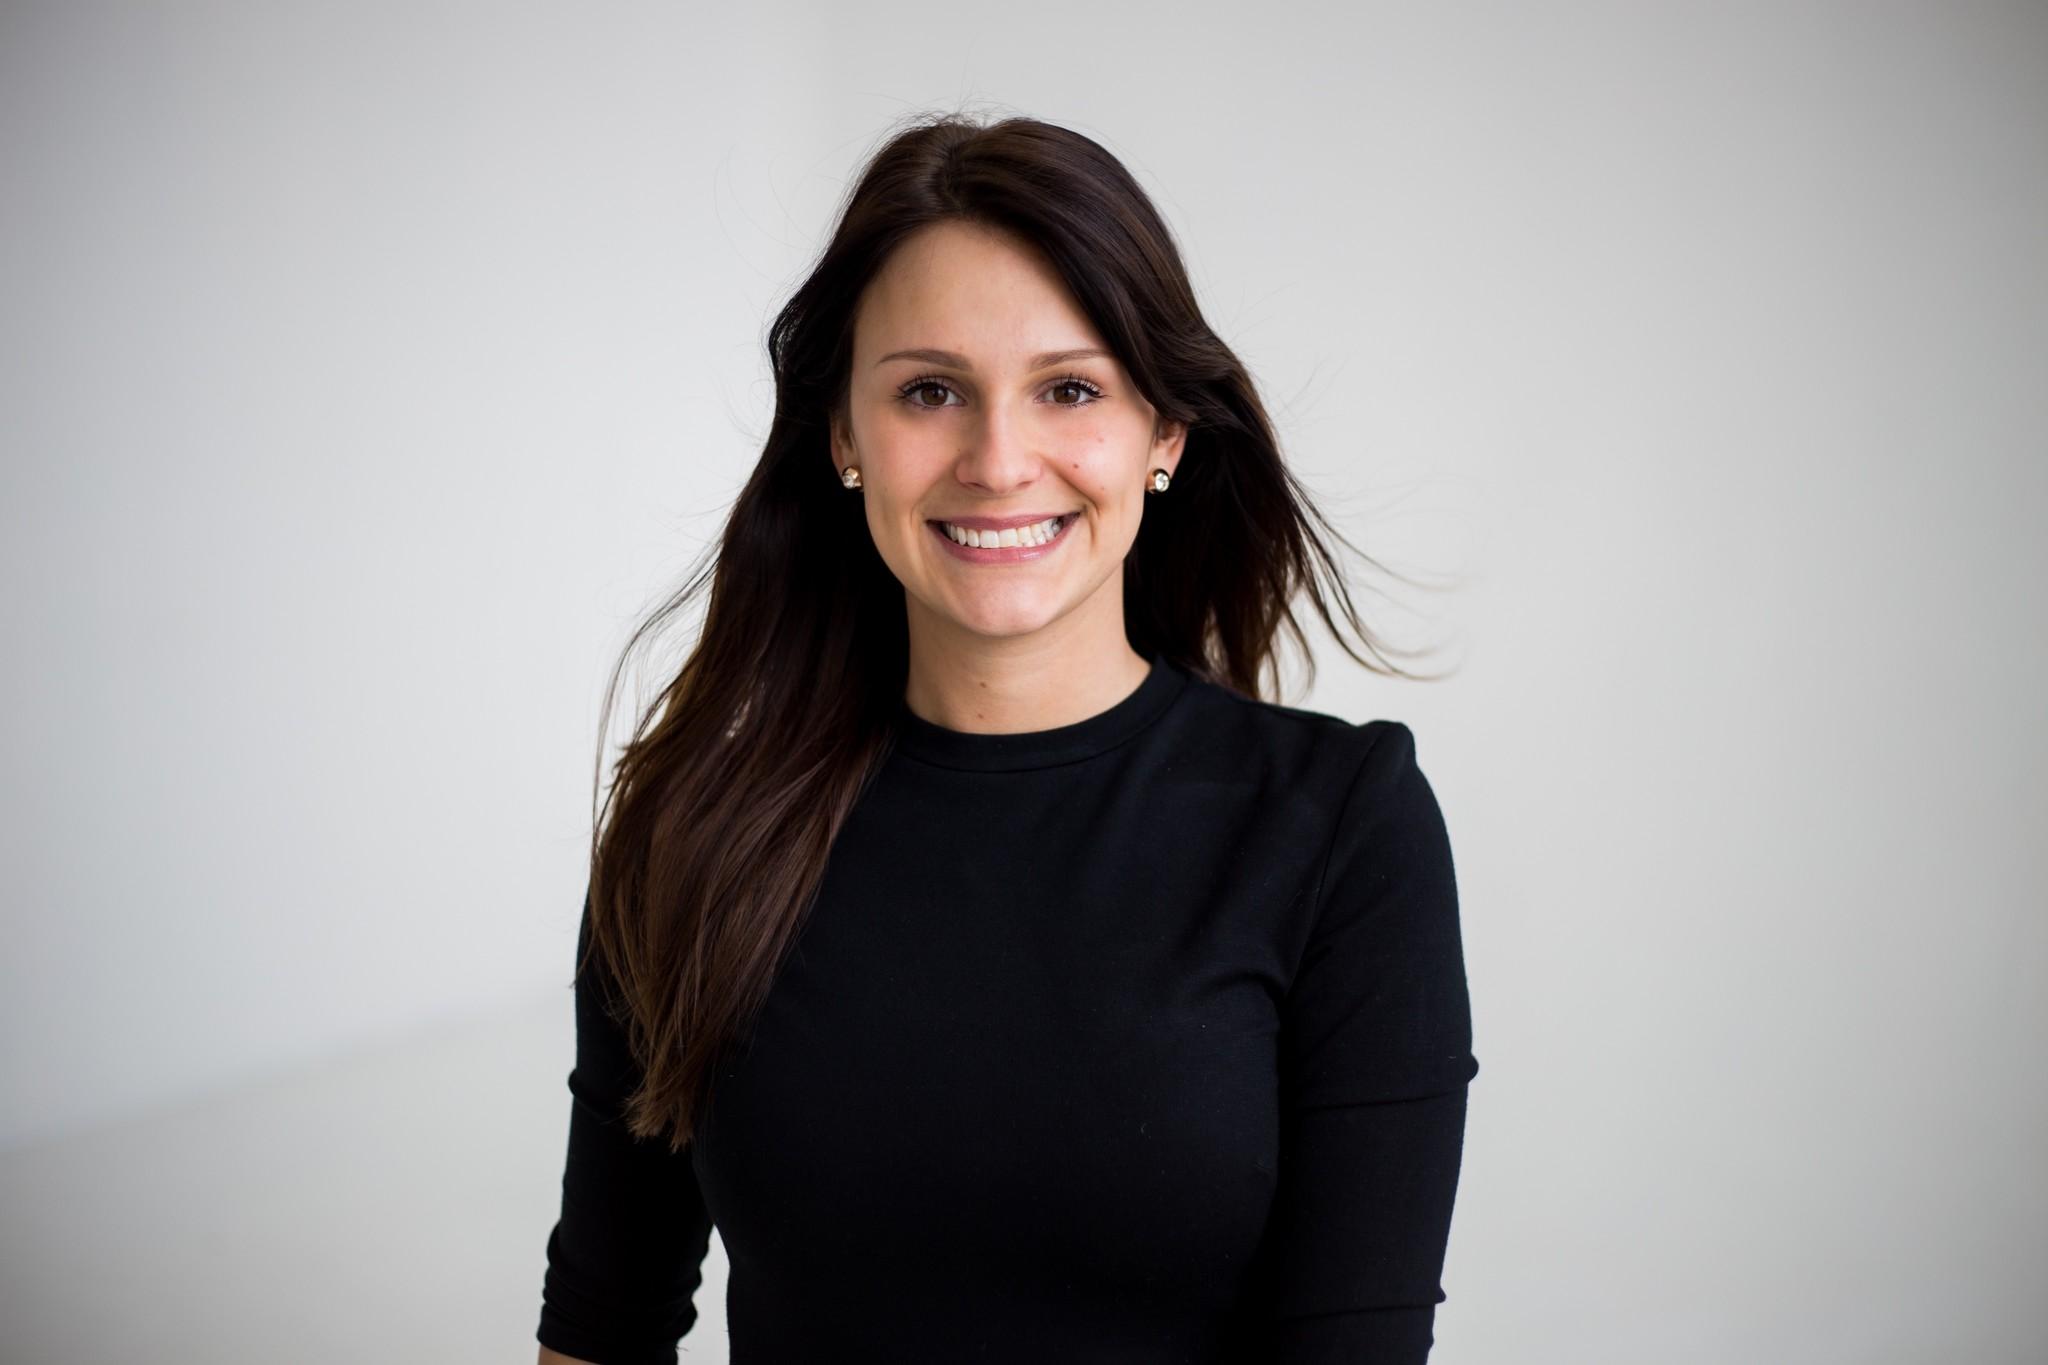 Alexandra Léonard, Apotikaire's Founder and President